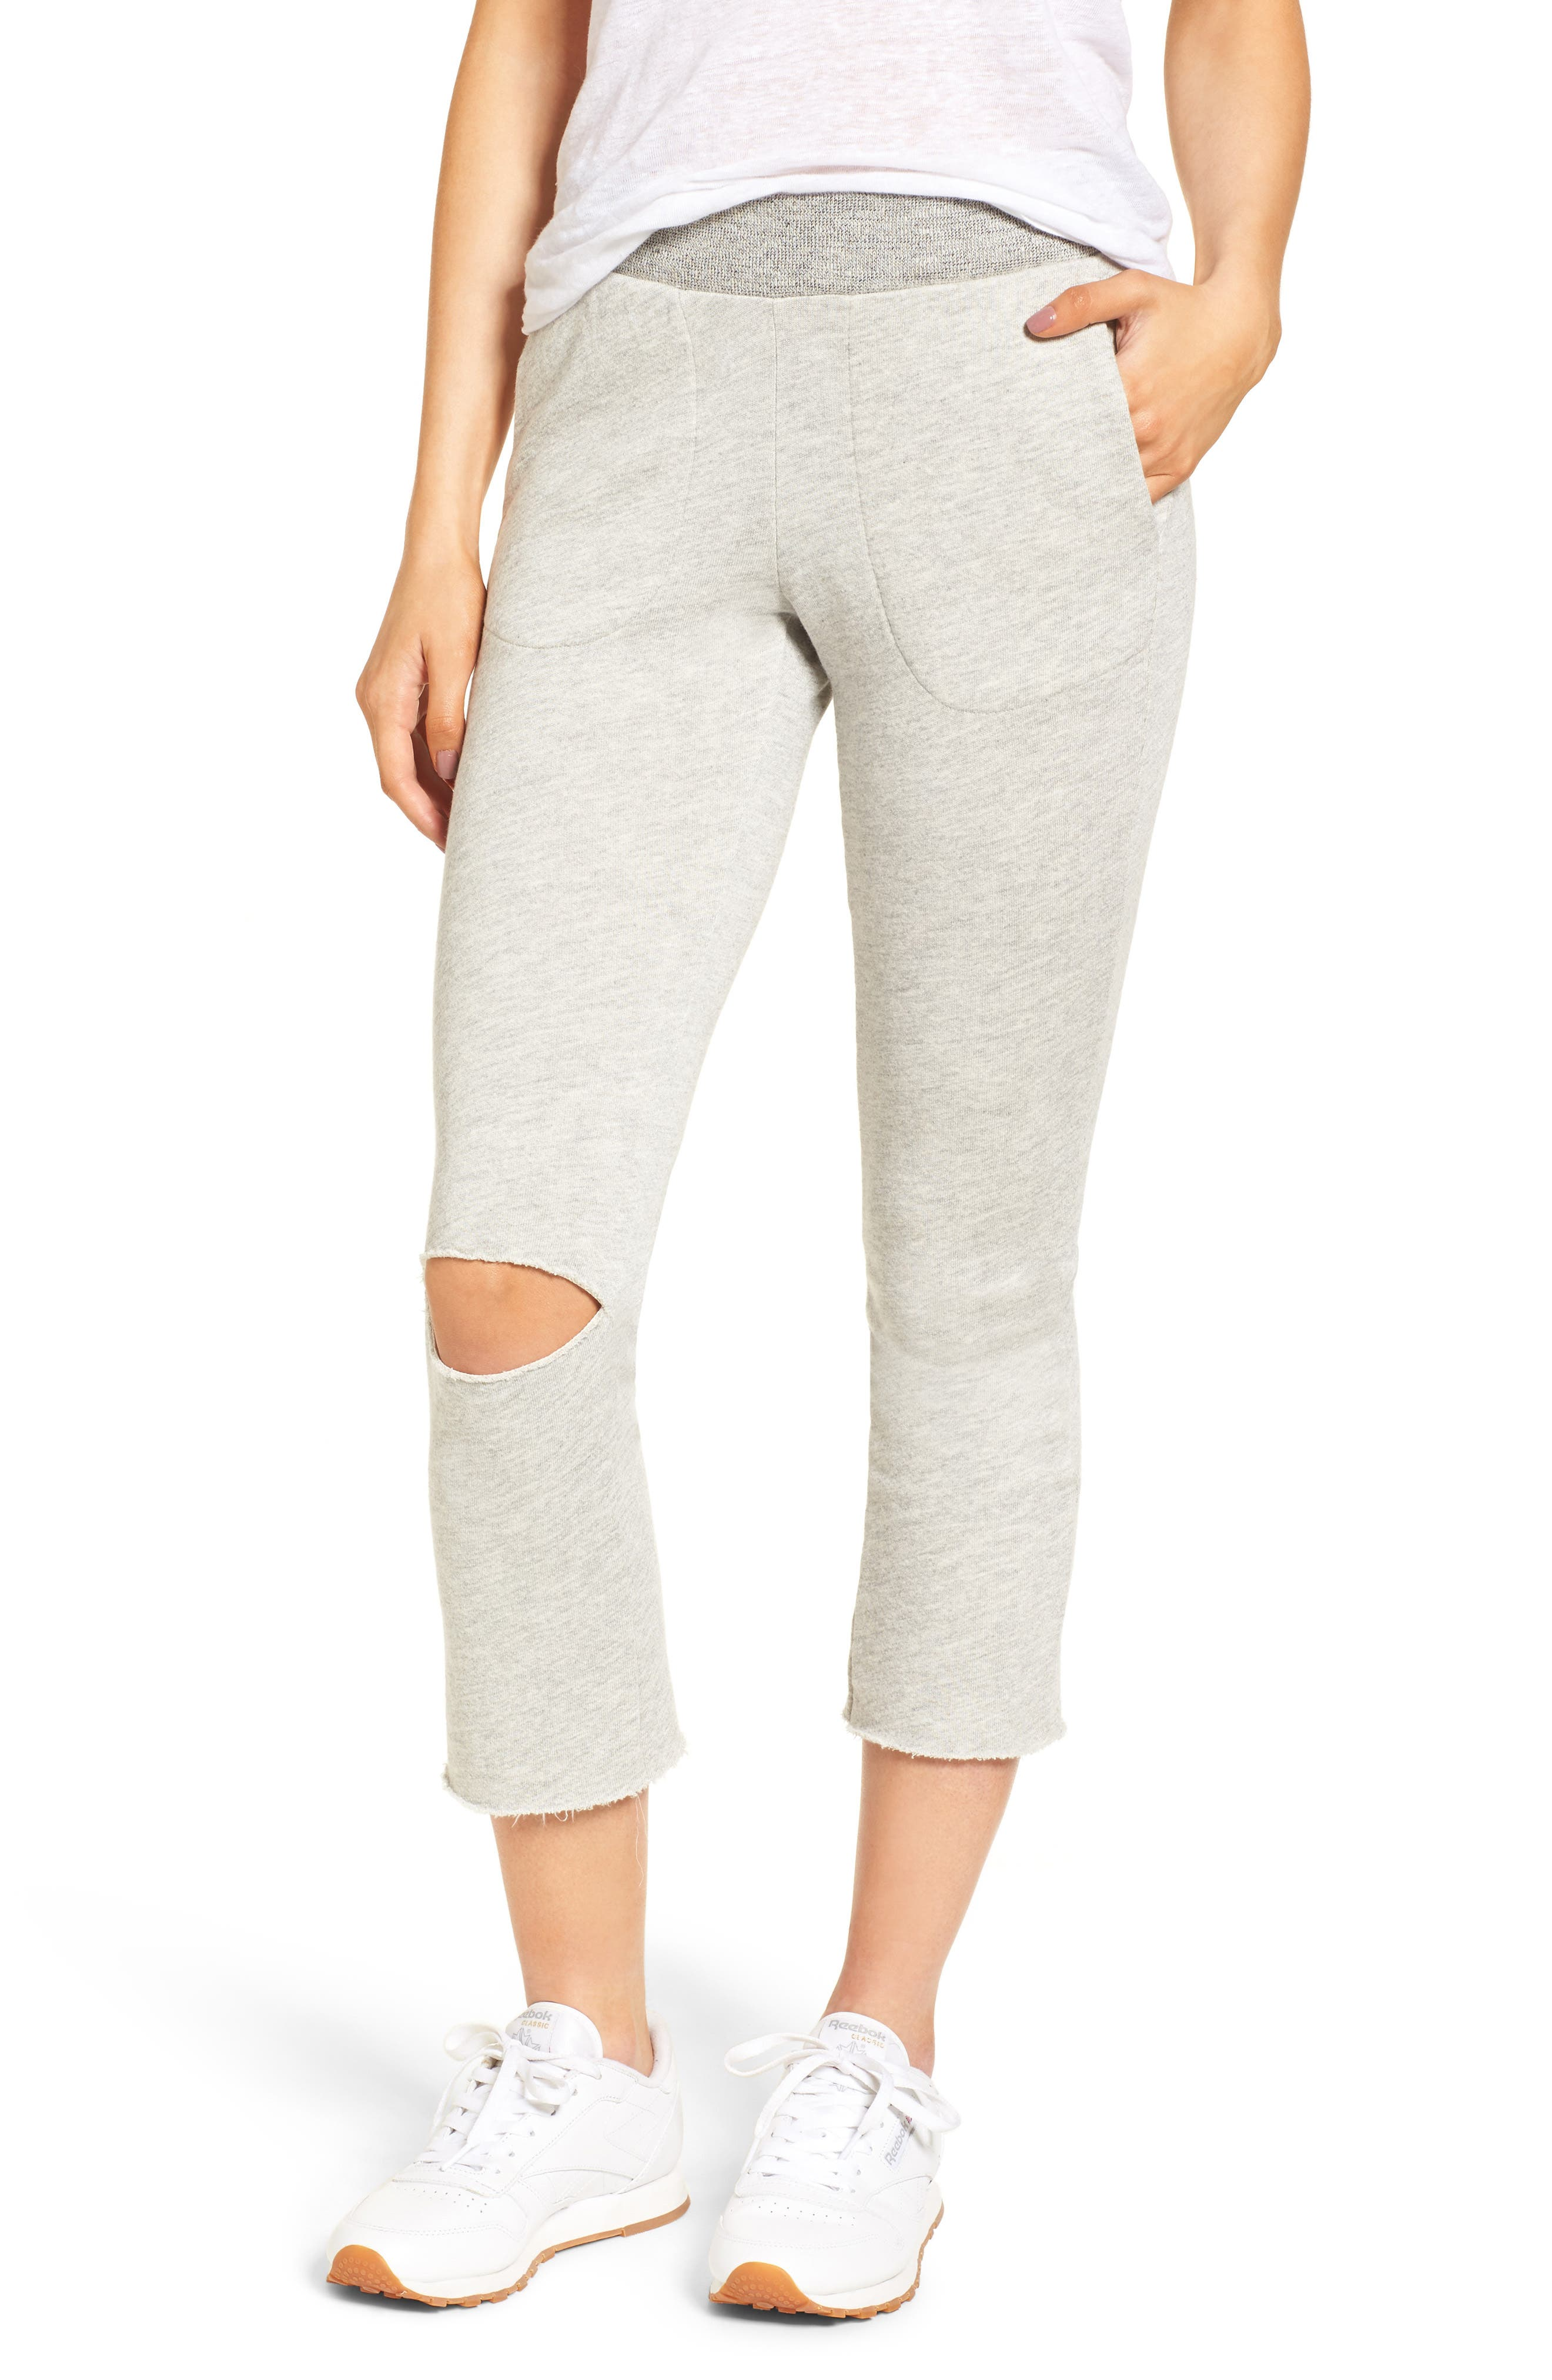 Malibu Slit Knee Sweatpants,                         Main,                         color, 030